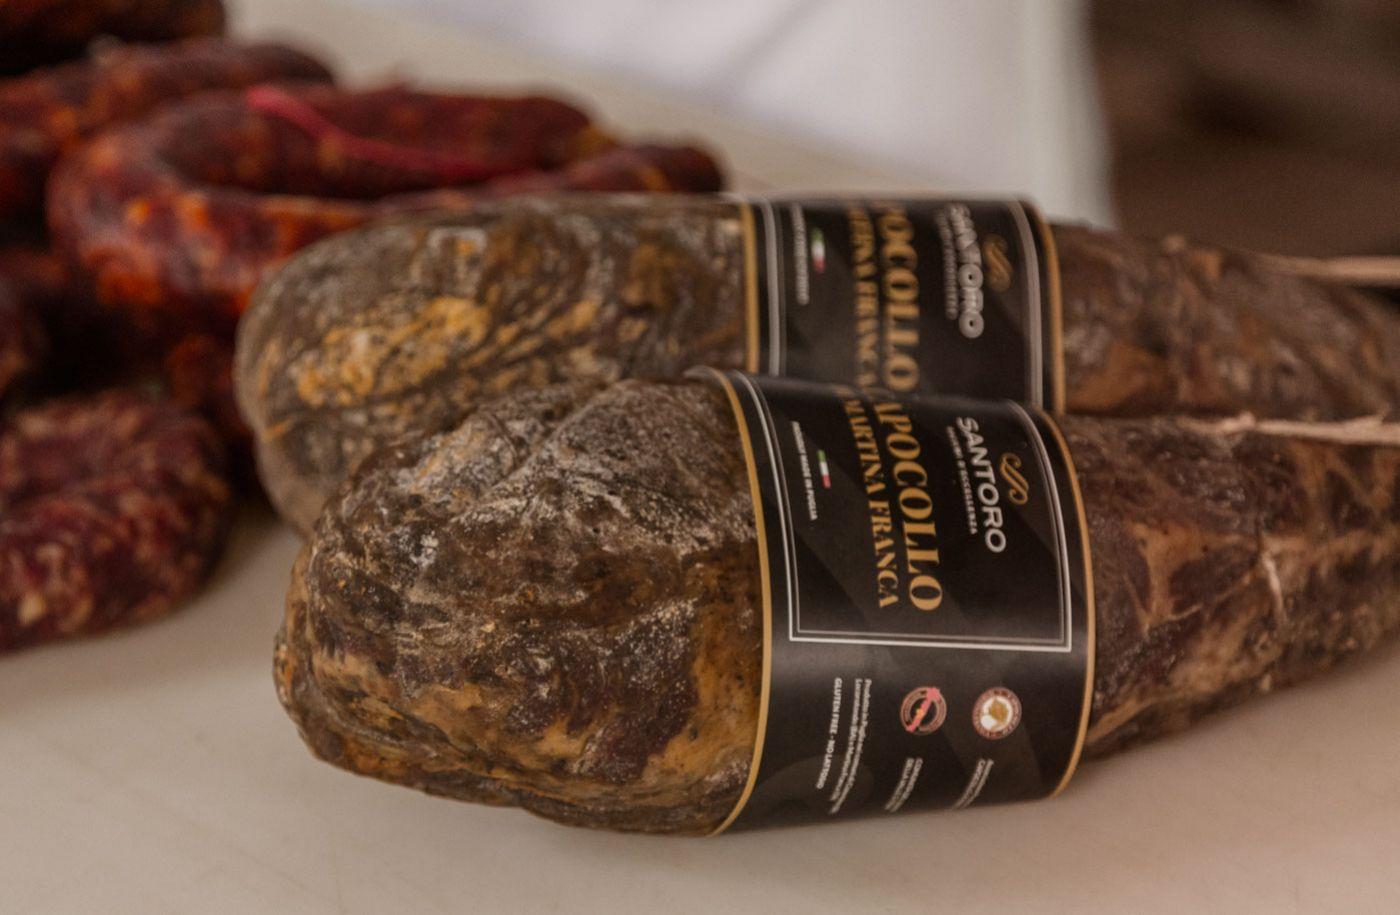 Capocolli and salami Santoro ready for sale